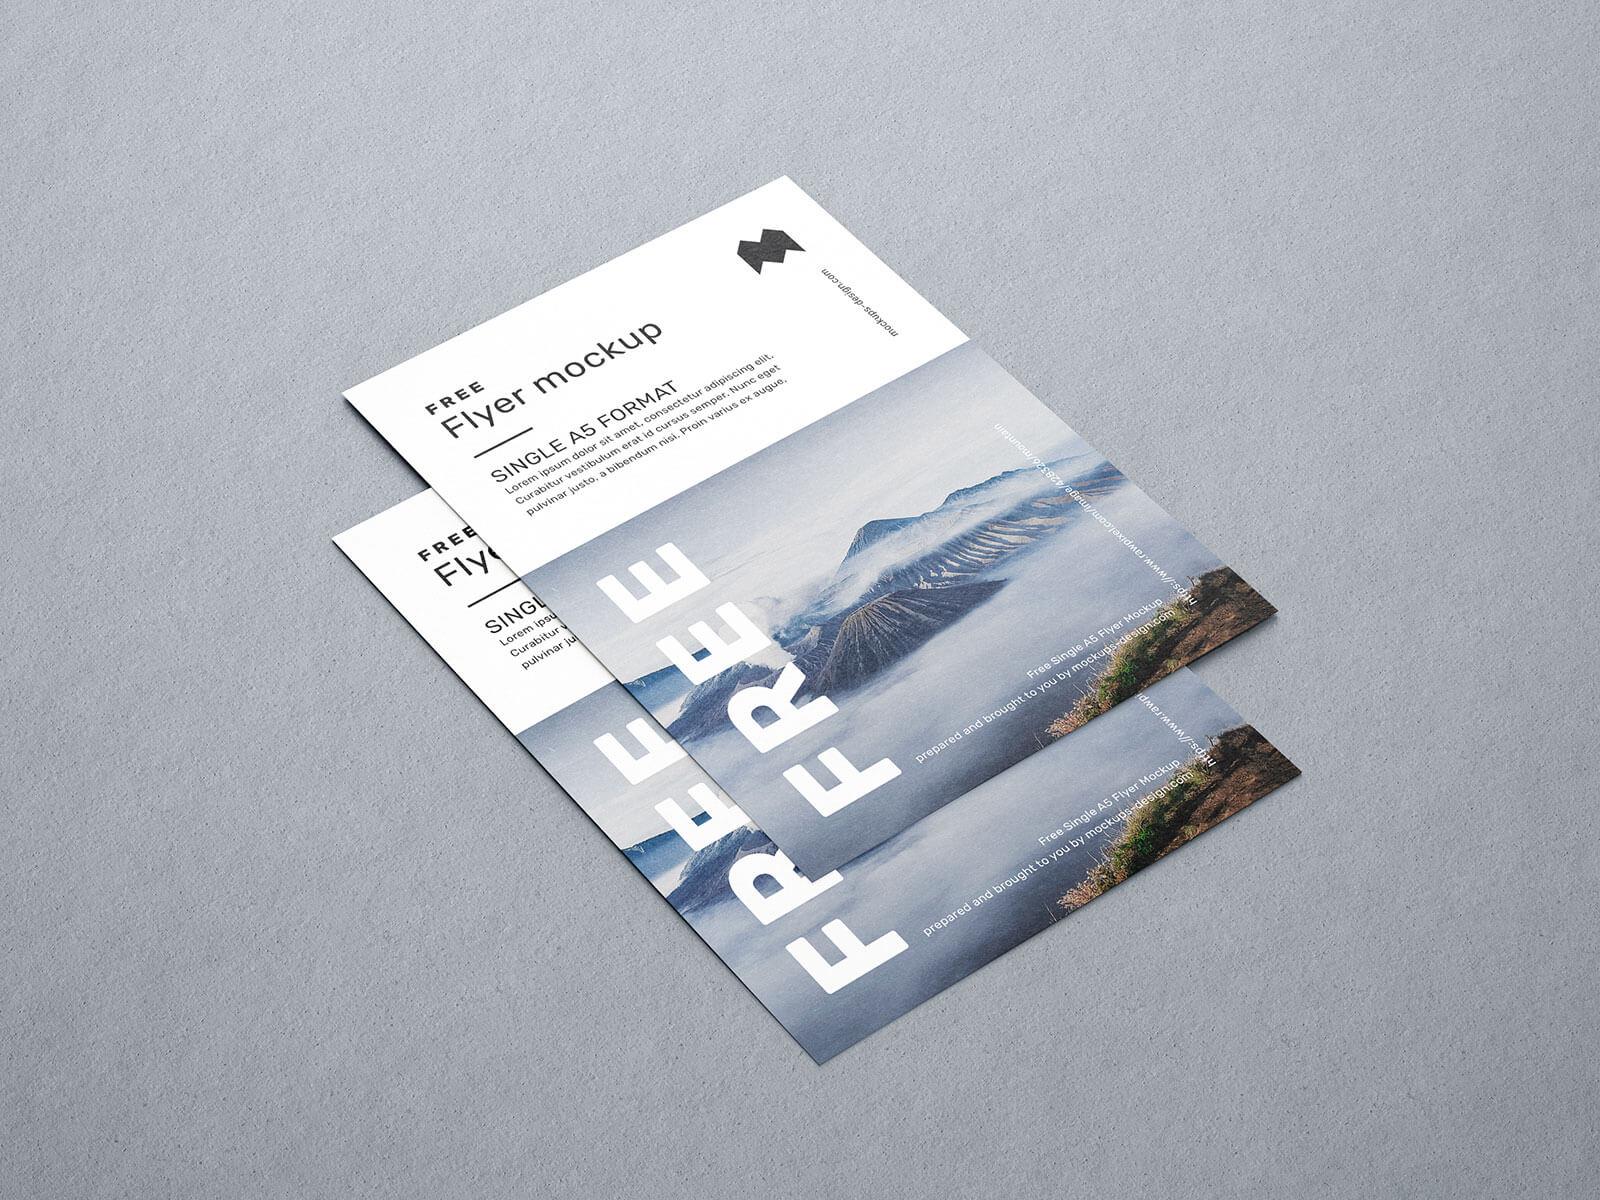 Free A5 Flyer Mockup PSD Set (4 Renders)